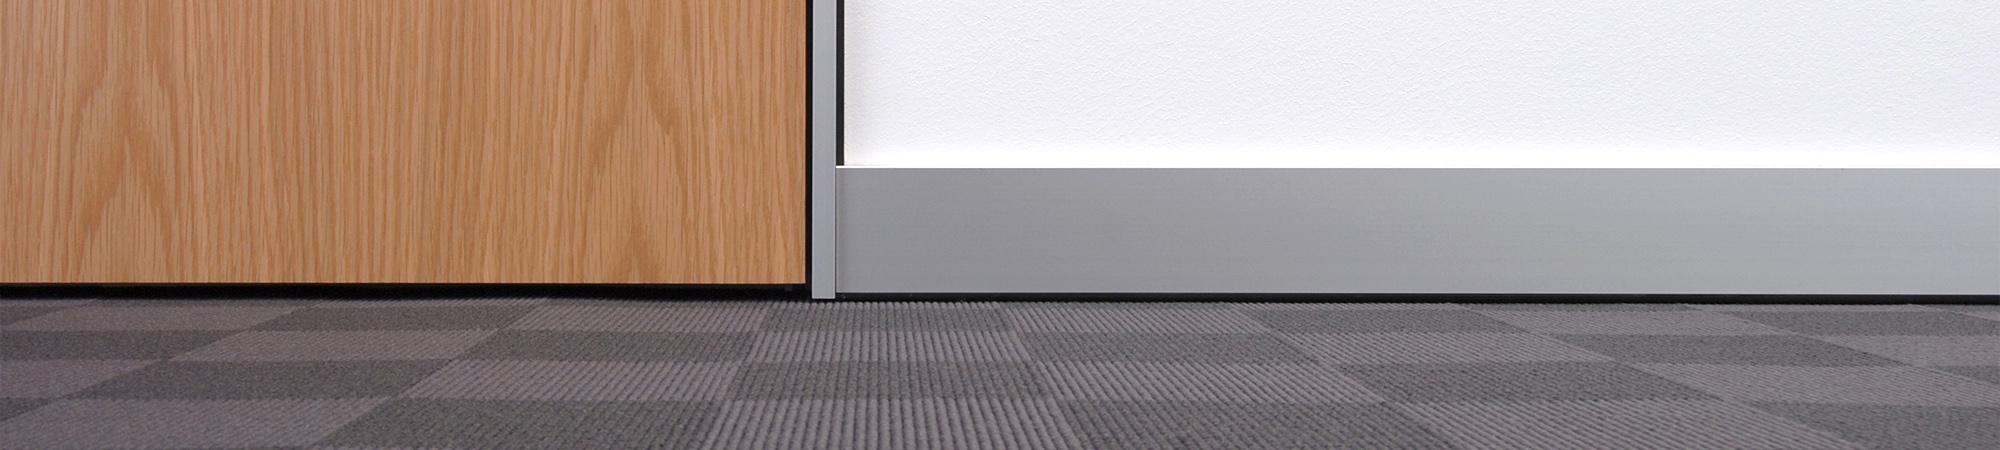 sockelprofile sockelleisten fu leisten und winkelprofile. Black Bedroom Furniture Sets. Home Design Ideas